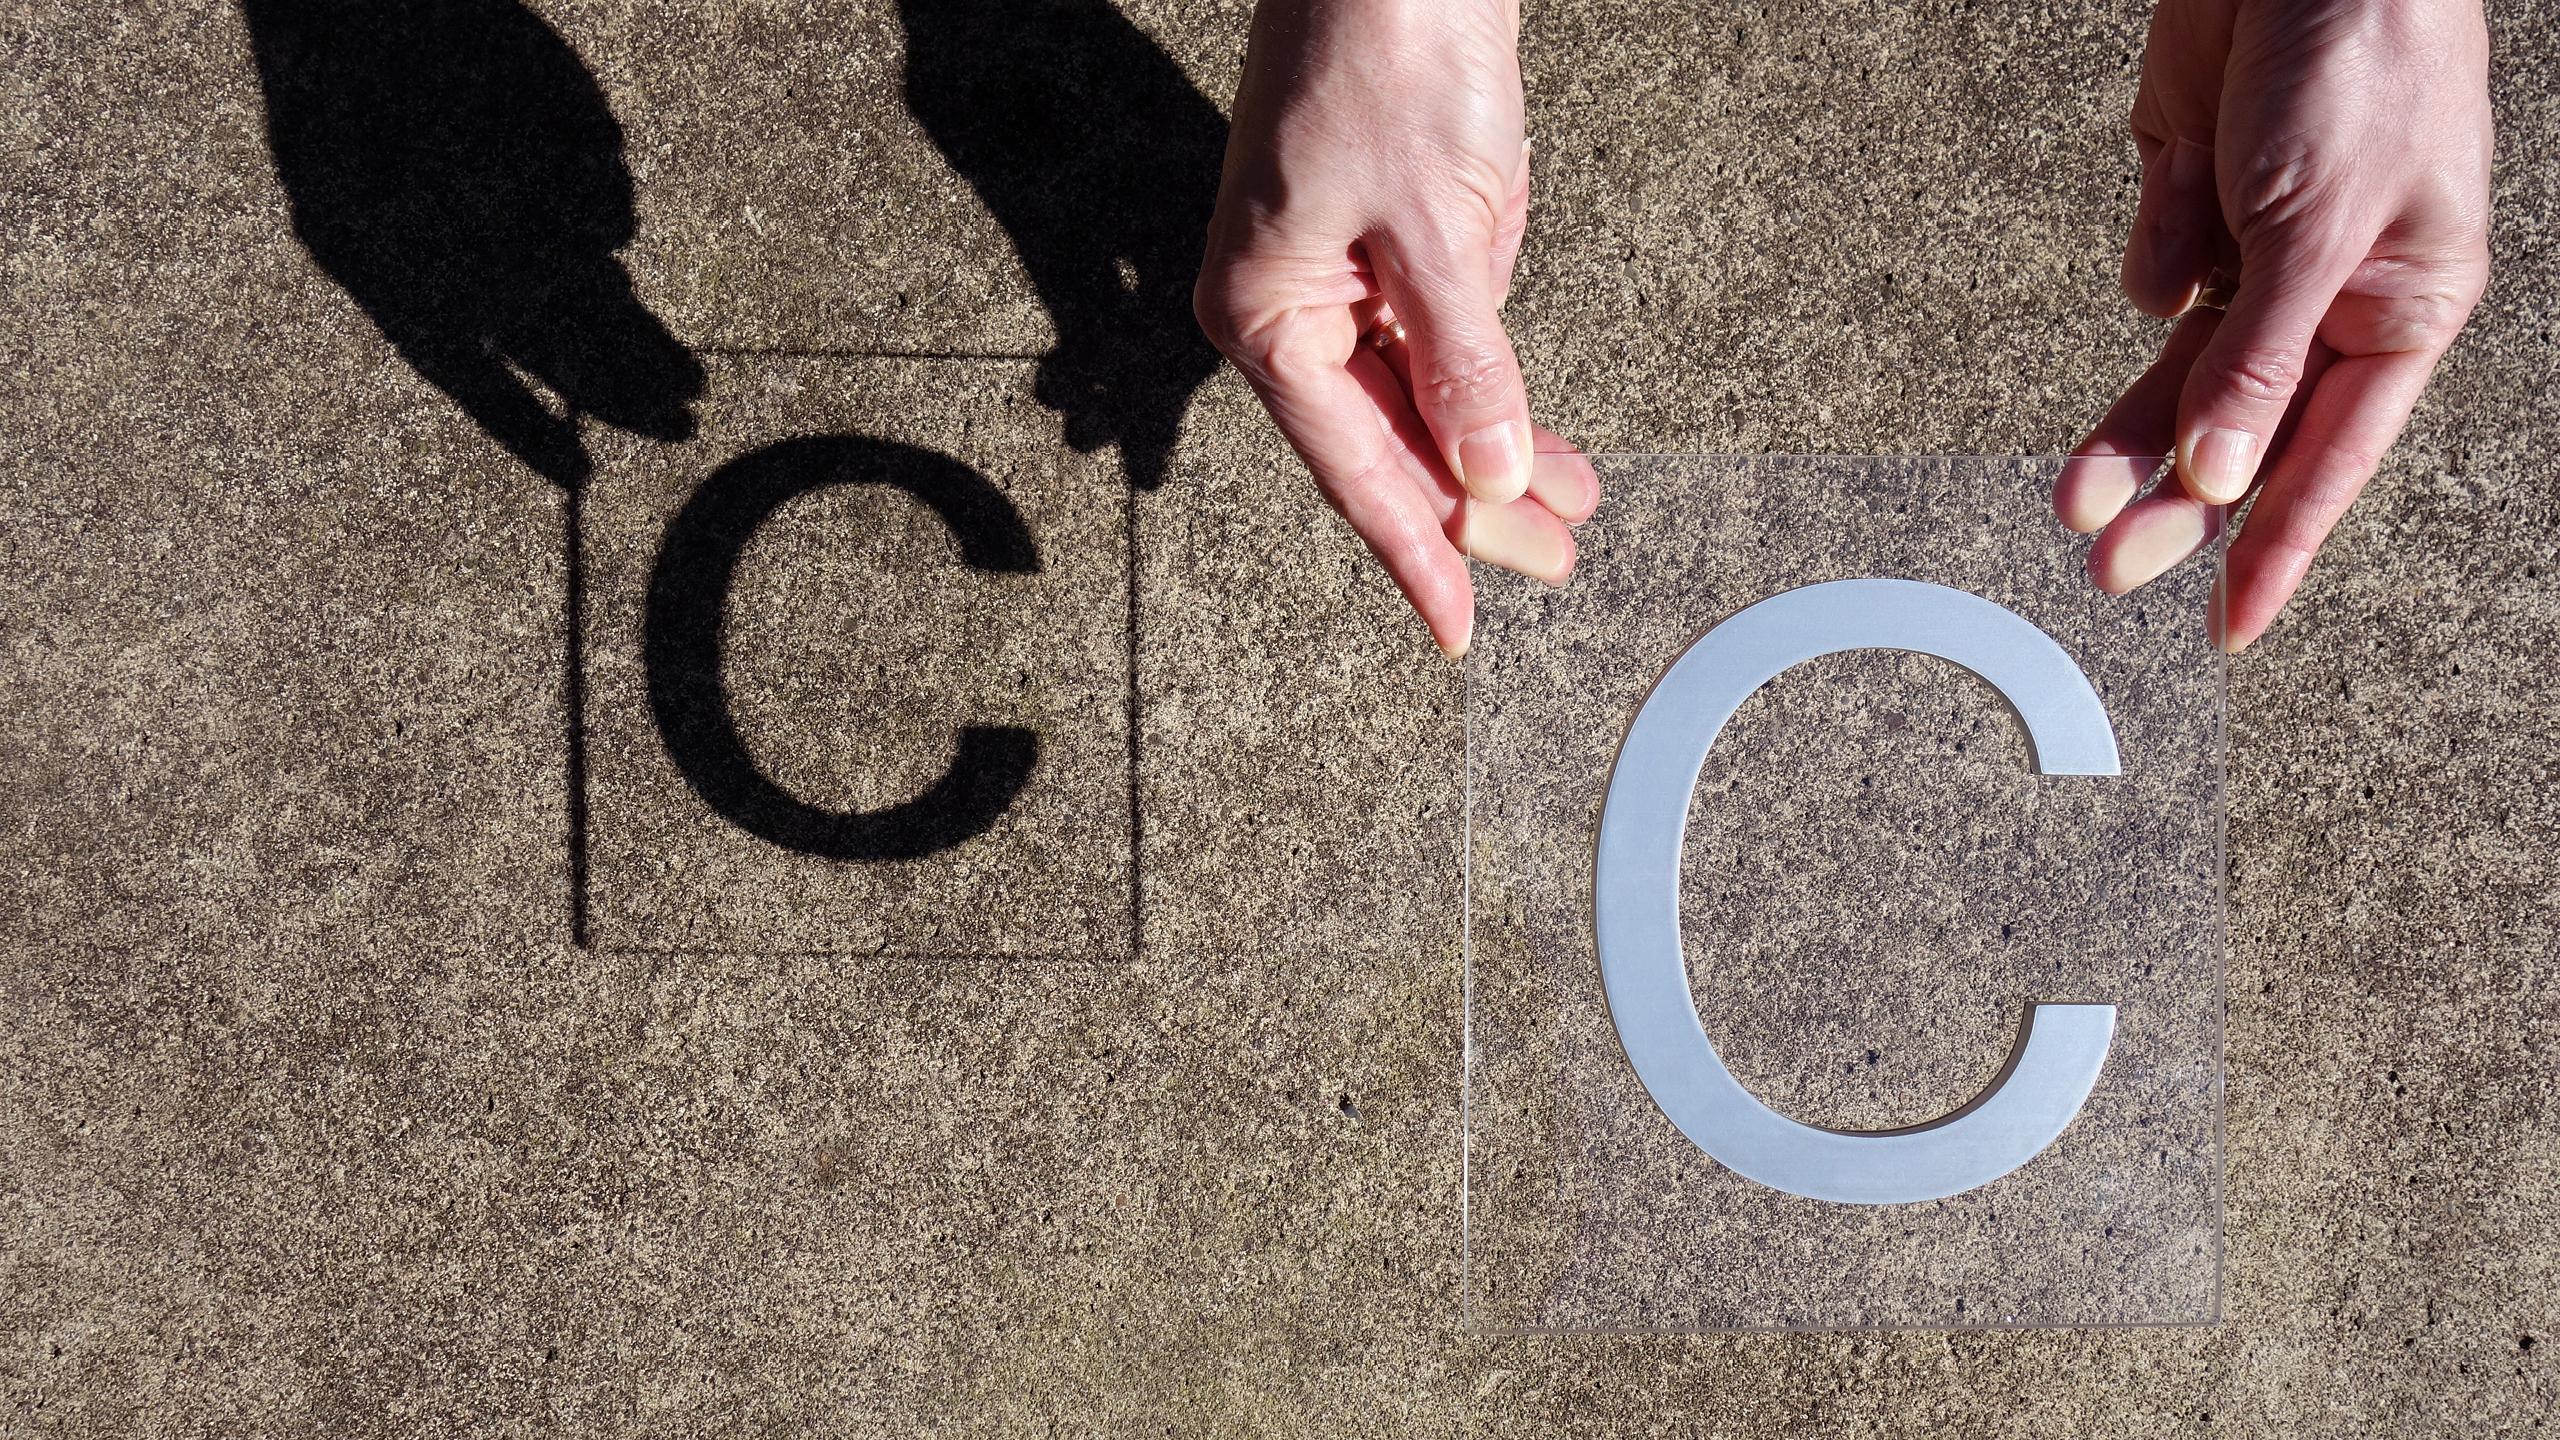 Storytelling, Artwork, Graphic and Display Design: Scott Hall at Carnegie Mellon University / image 1